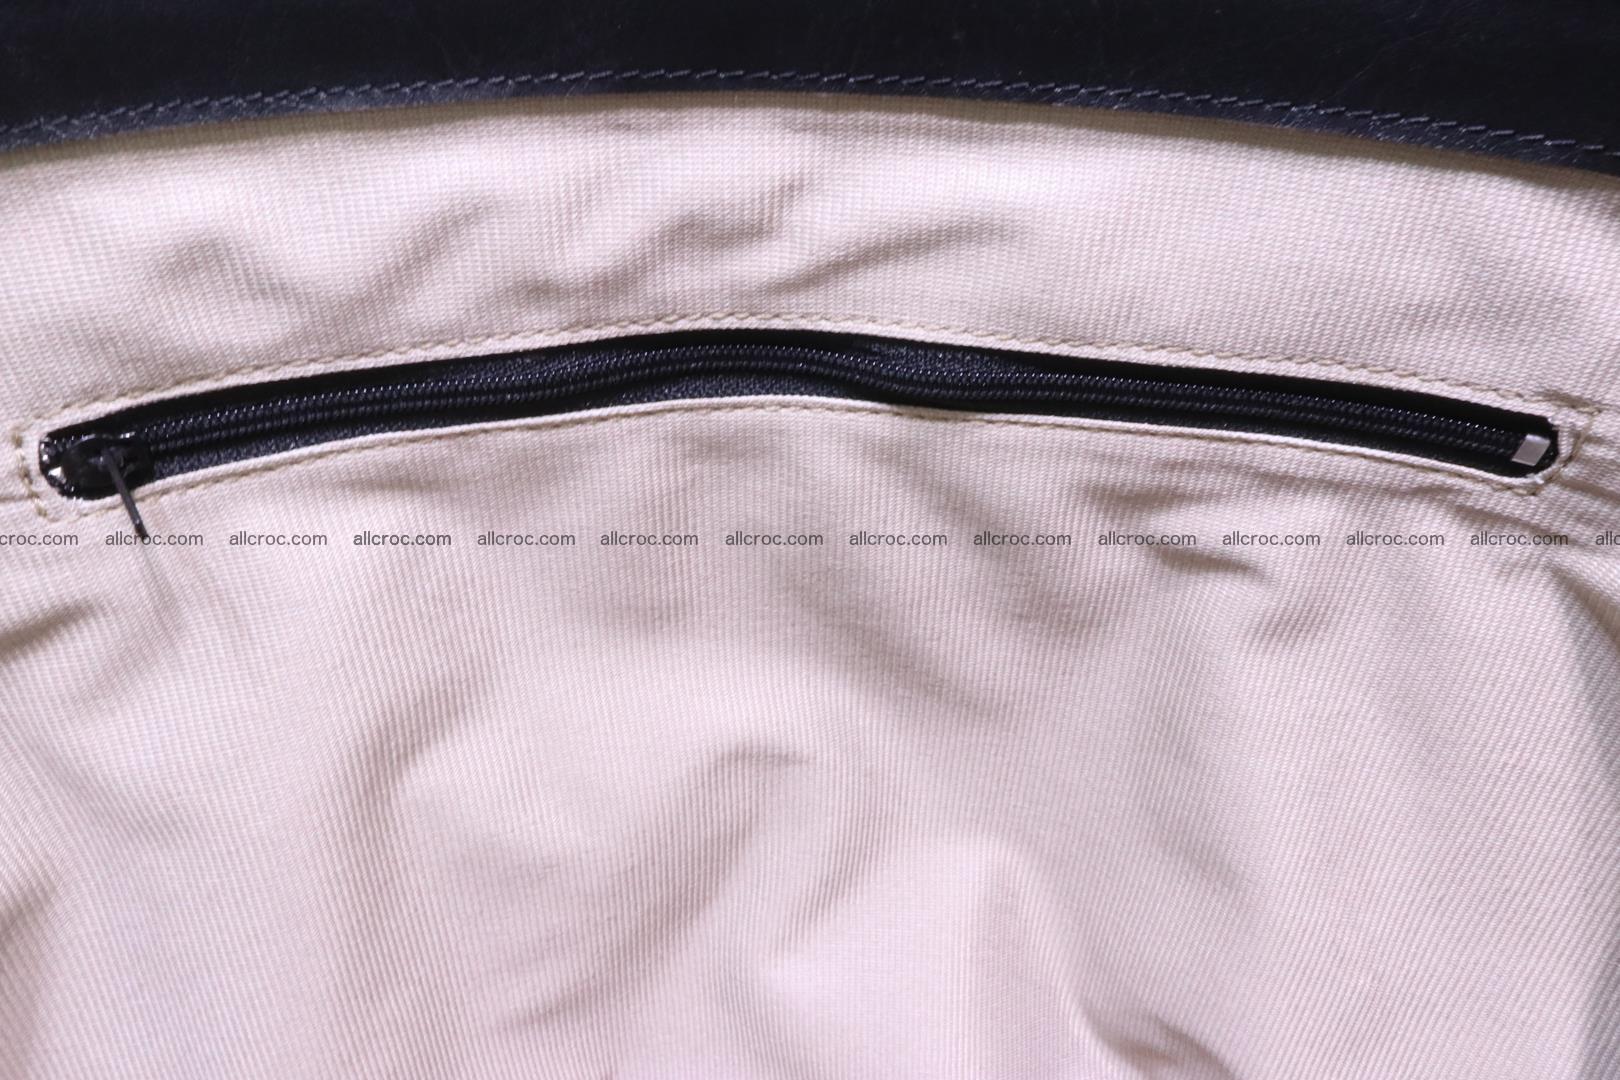 Handbag from cobra skin for lady 183 Foto 17